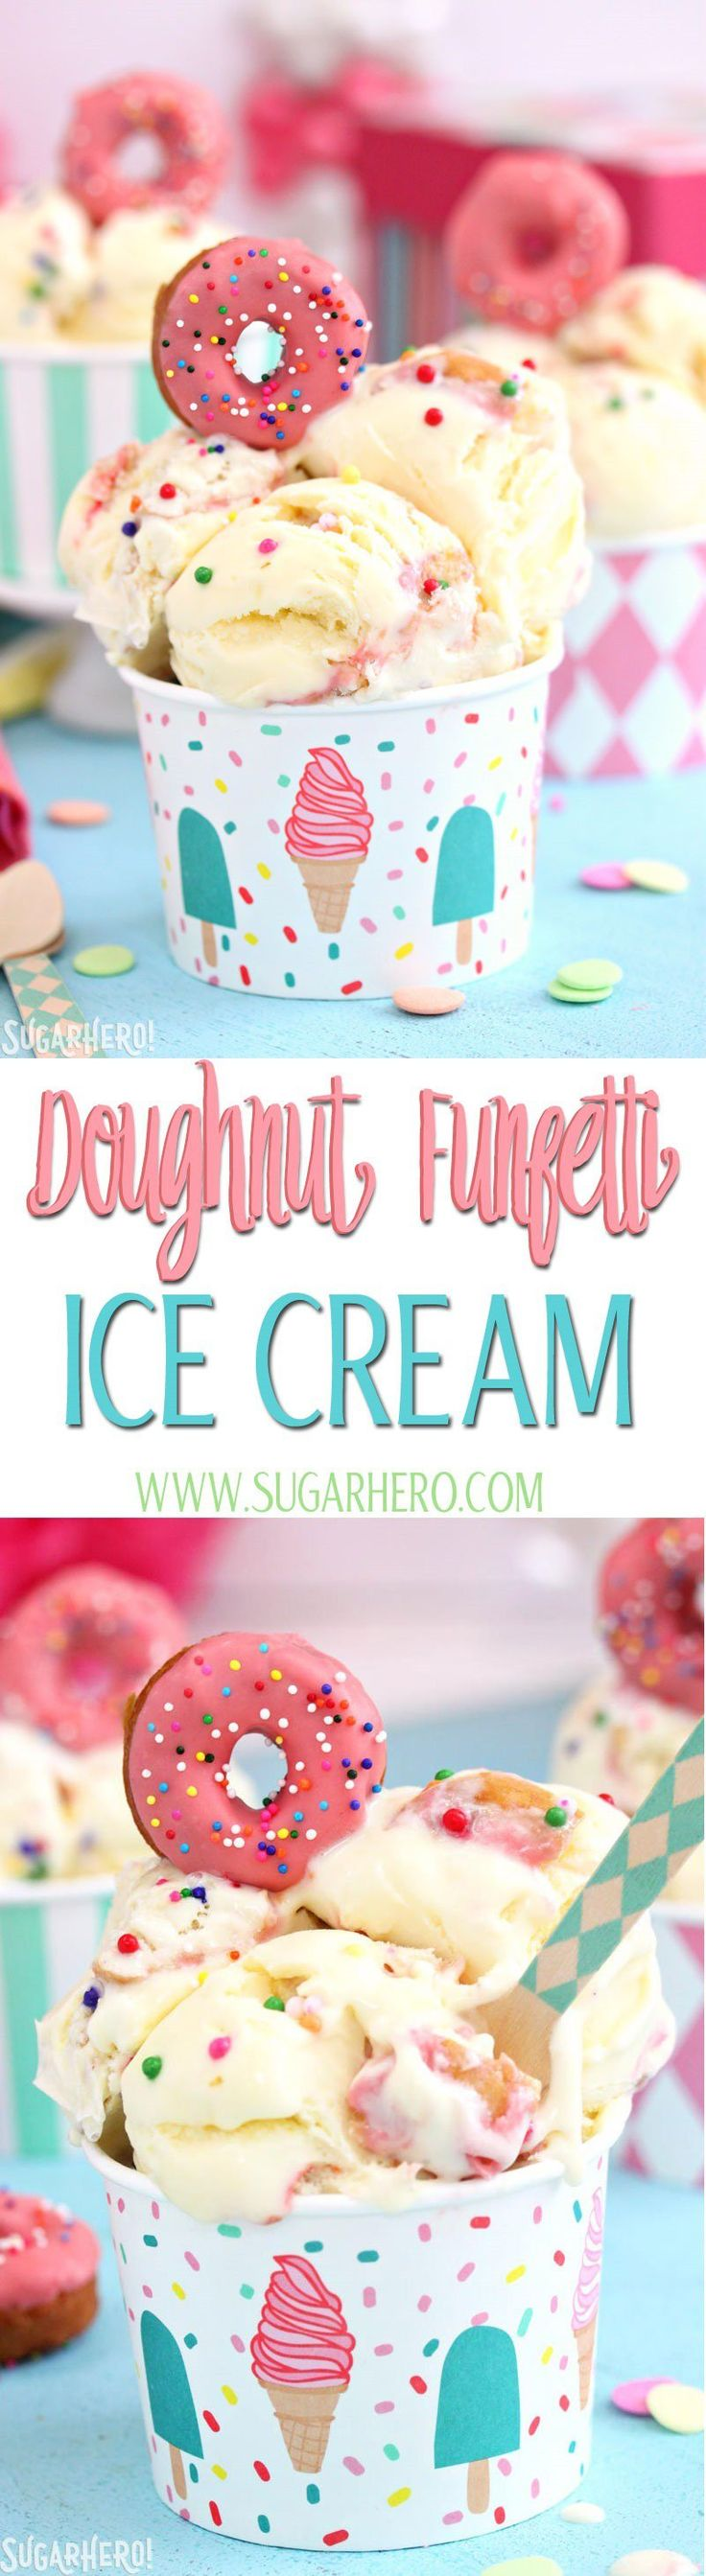 Doughnut Funfetti Ice Cream with Rainbow Sprinkles on Top!